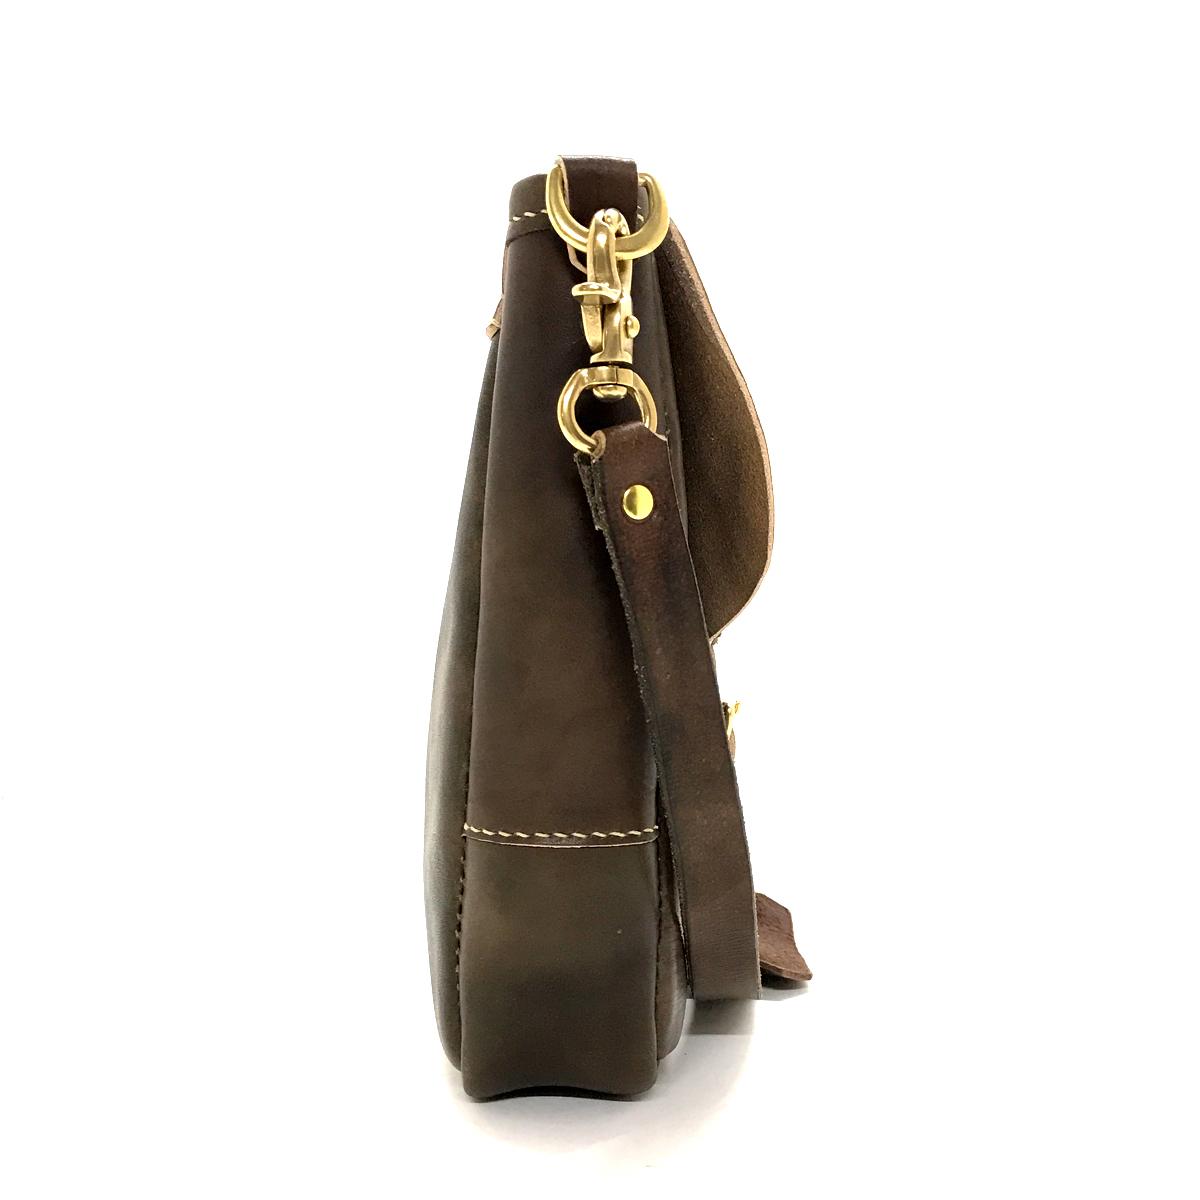 Antique Dyed Leather Concho Shoulder Bag Midium